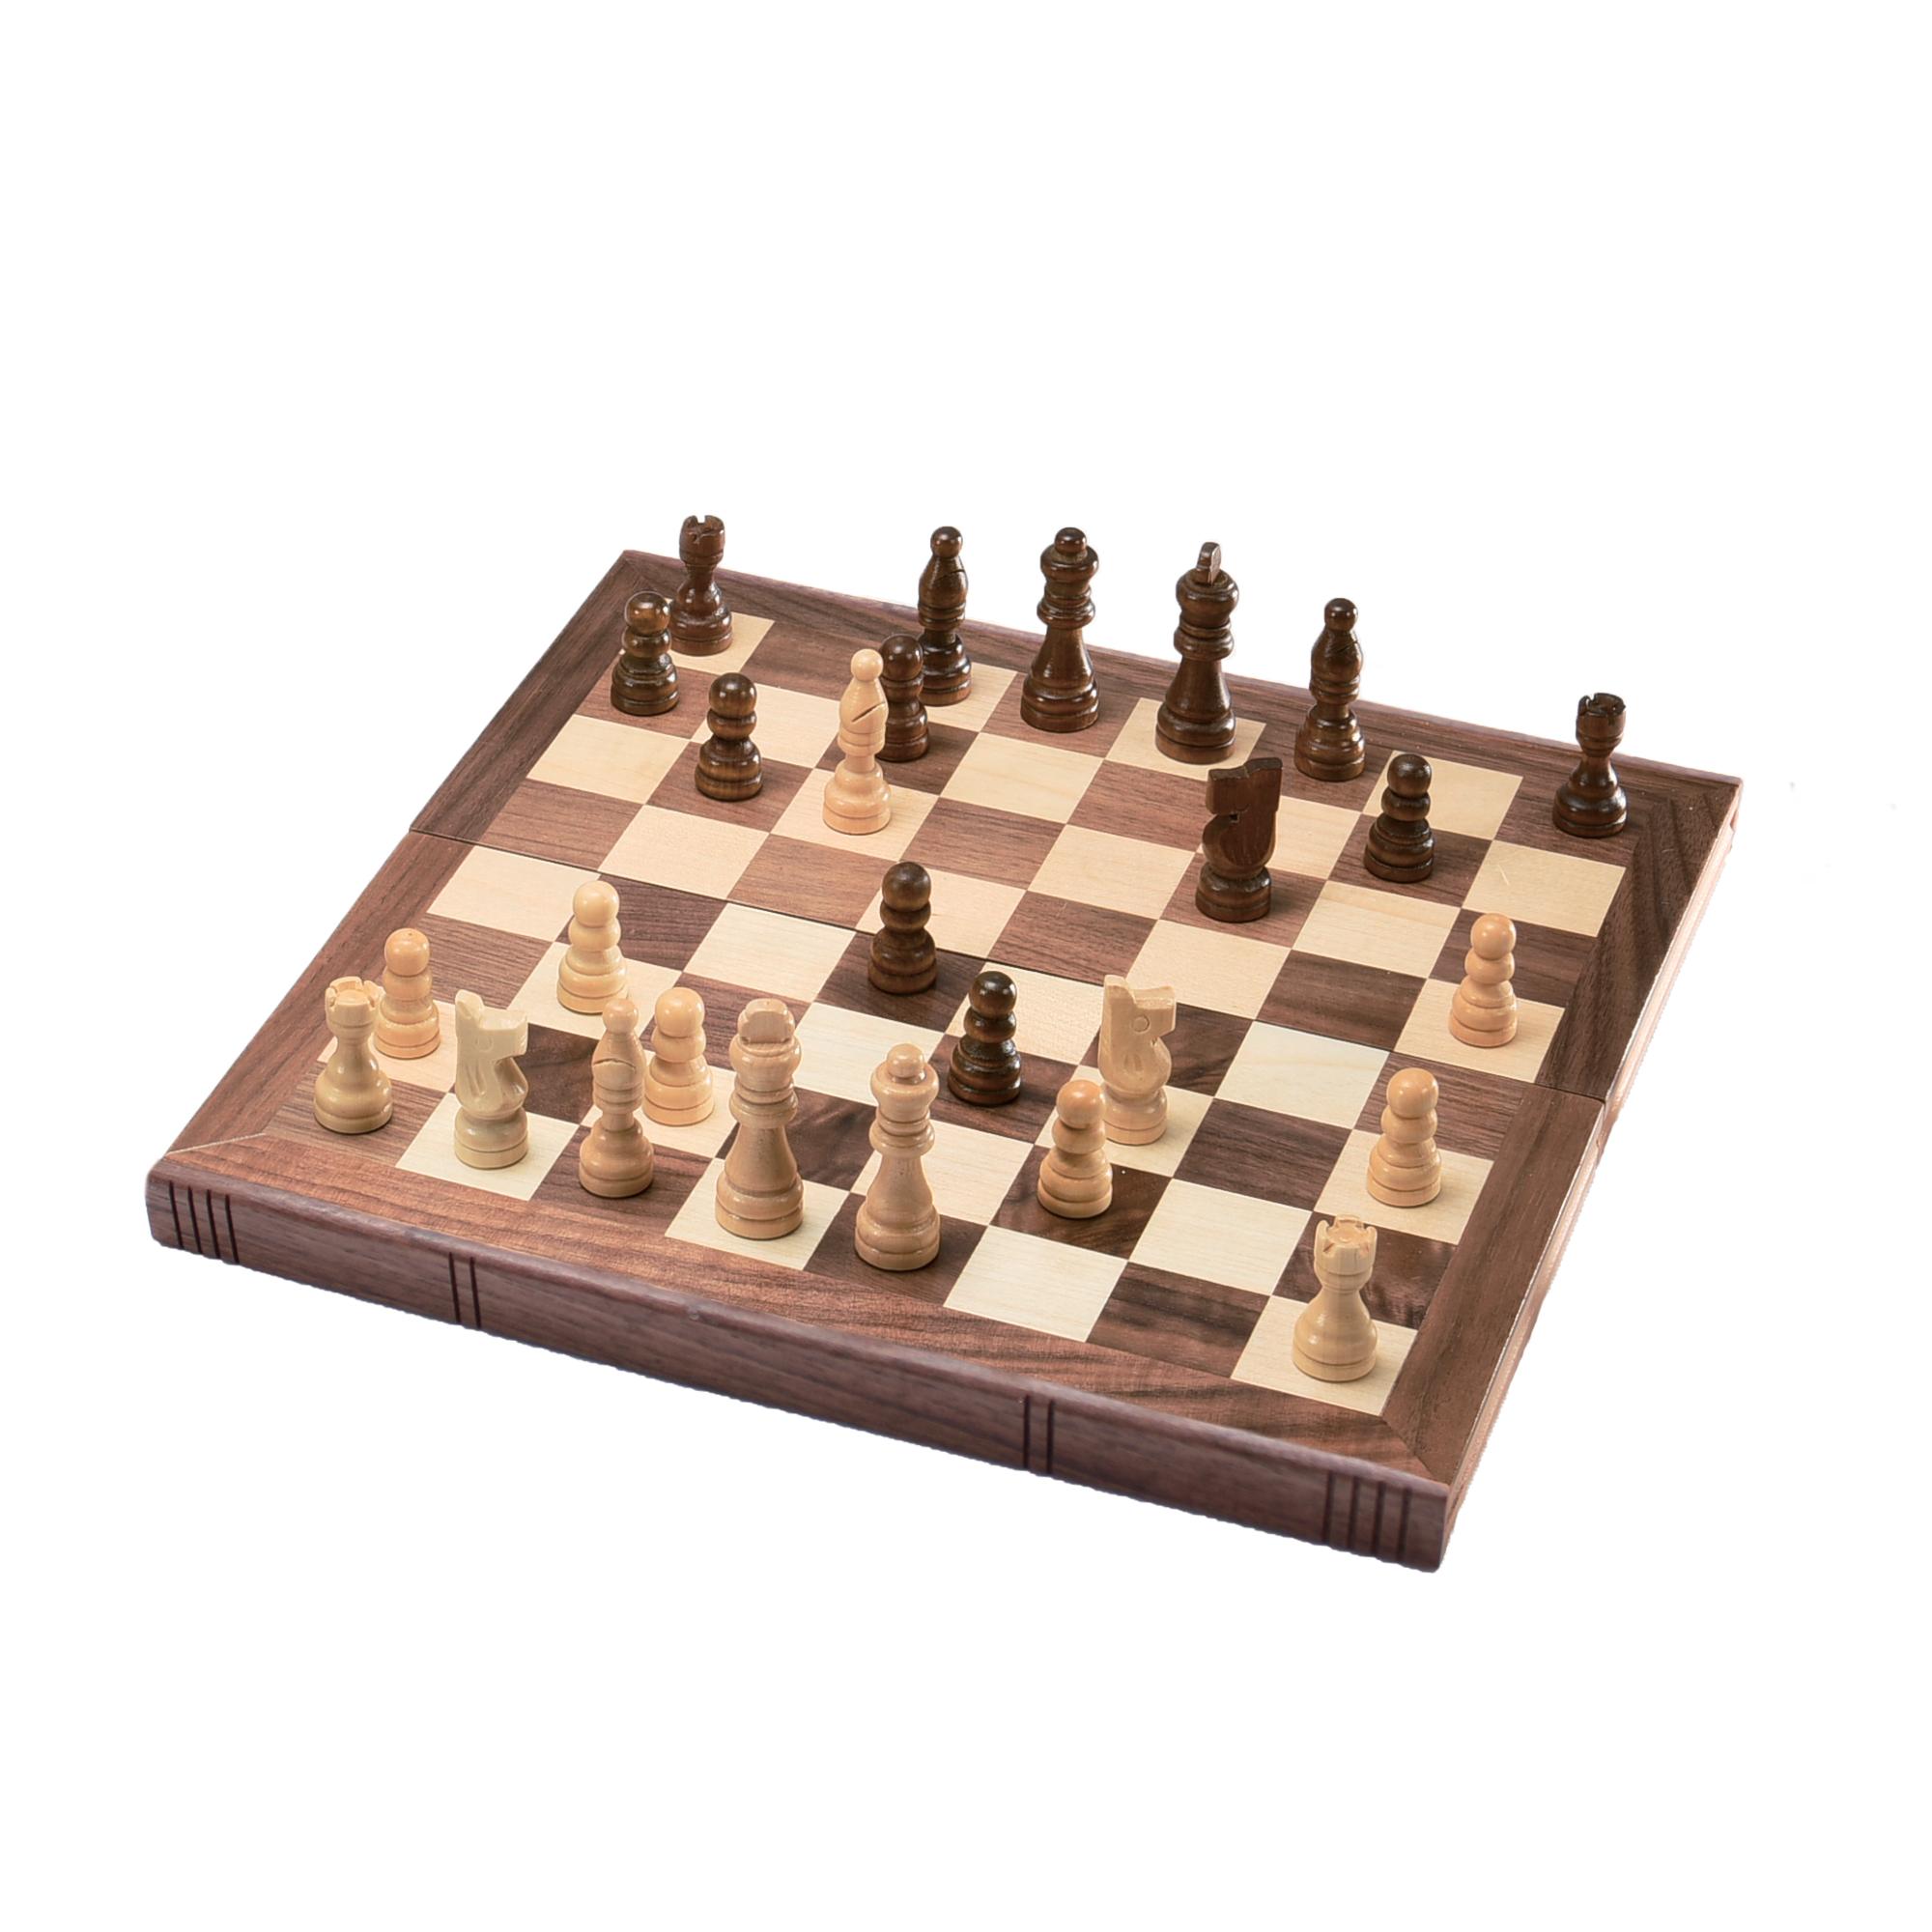 ChessCheckersBack-Echecs